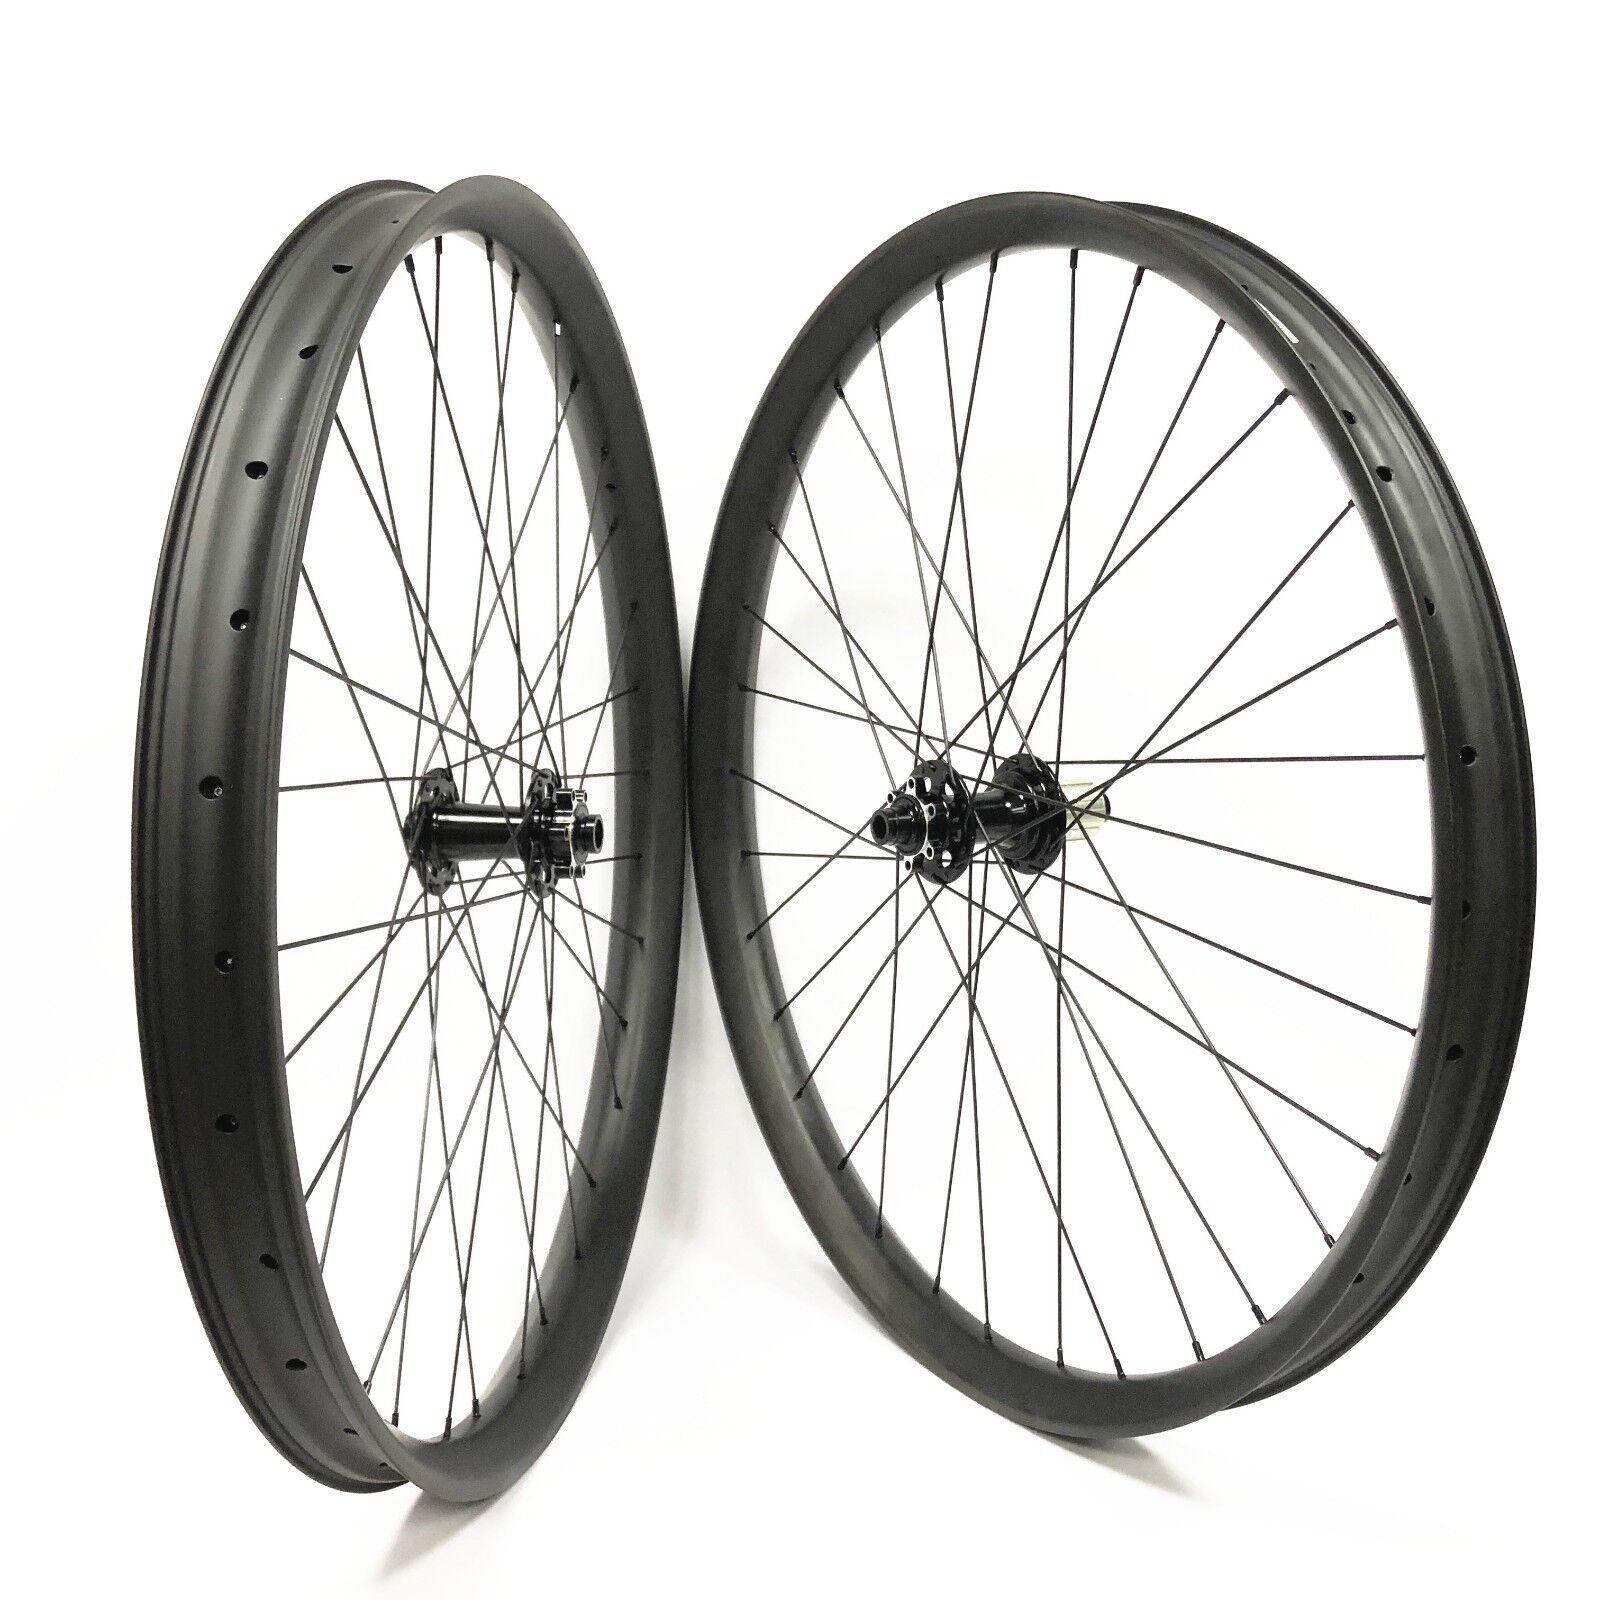 29er Mountain Bike Carbon Wheelset 50mm Width 25mm Depth with boost hub 110 148